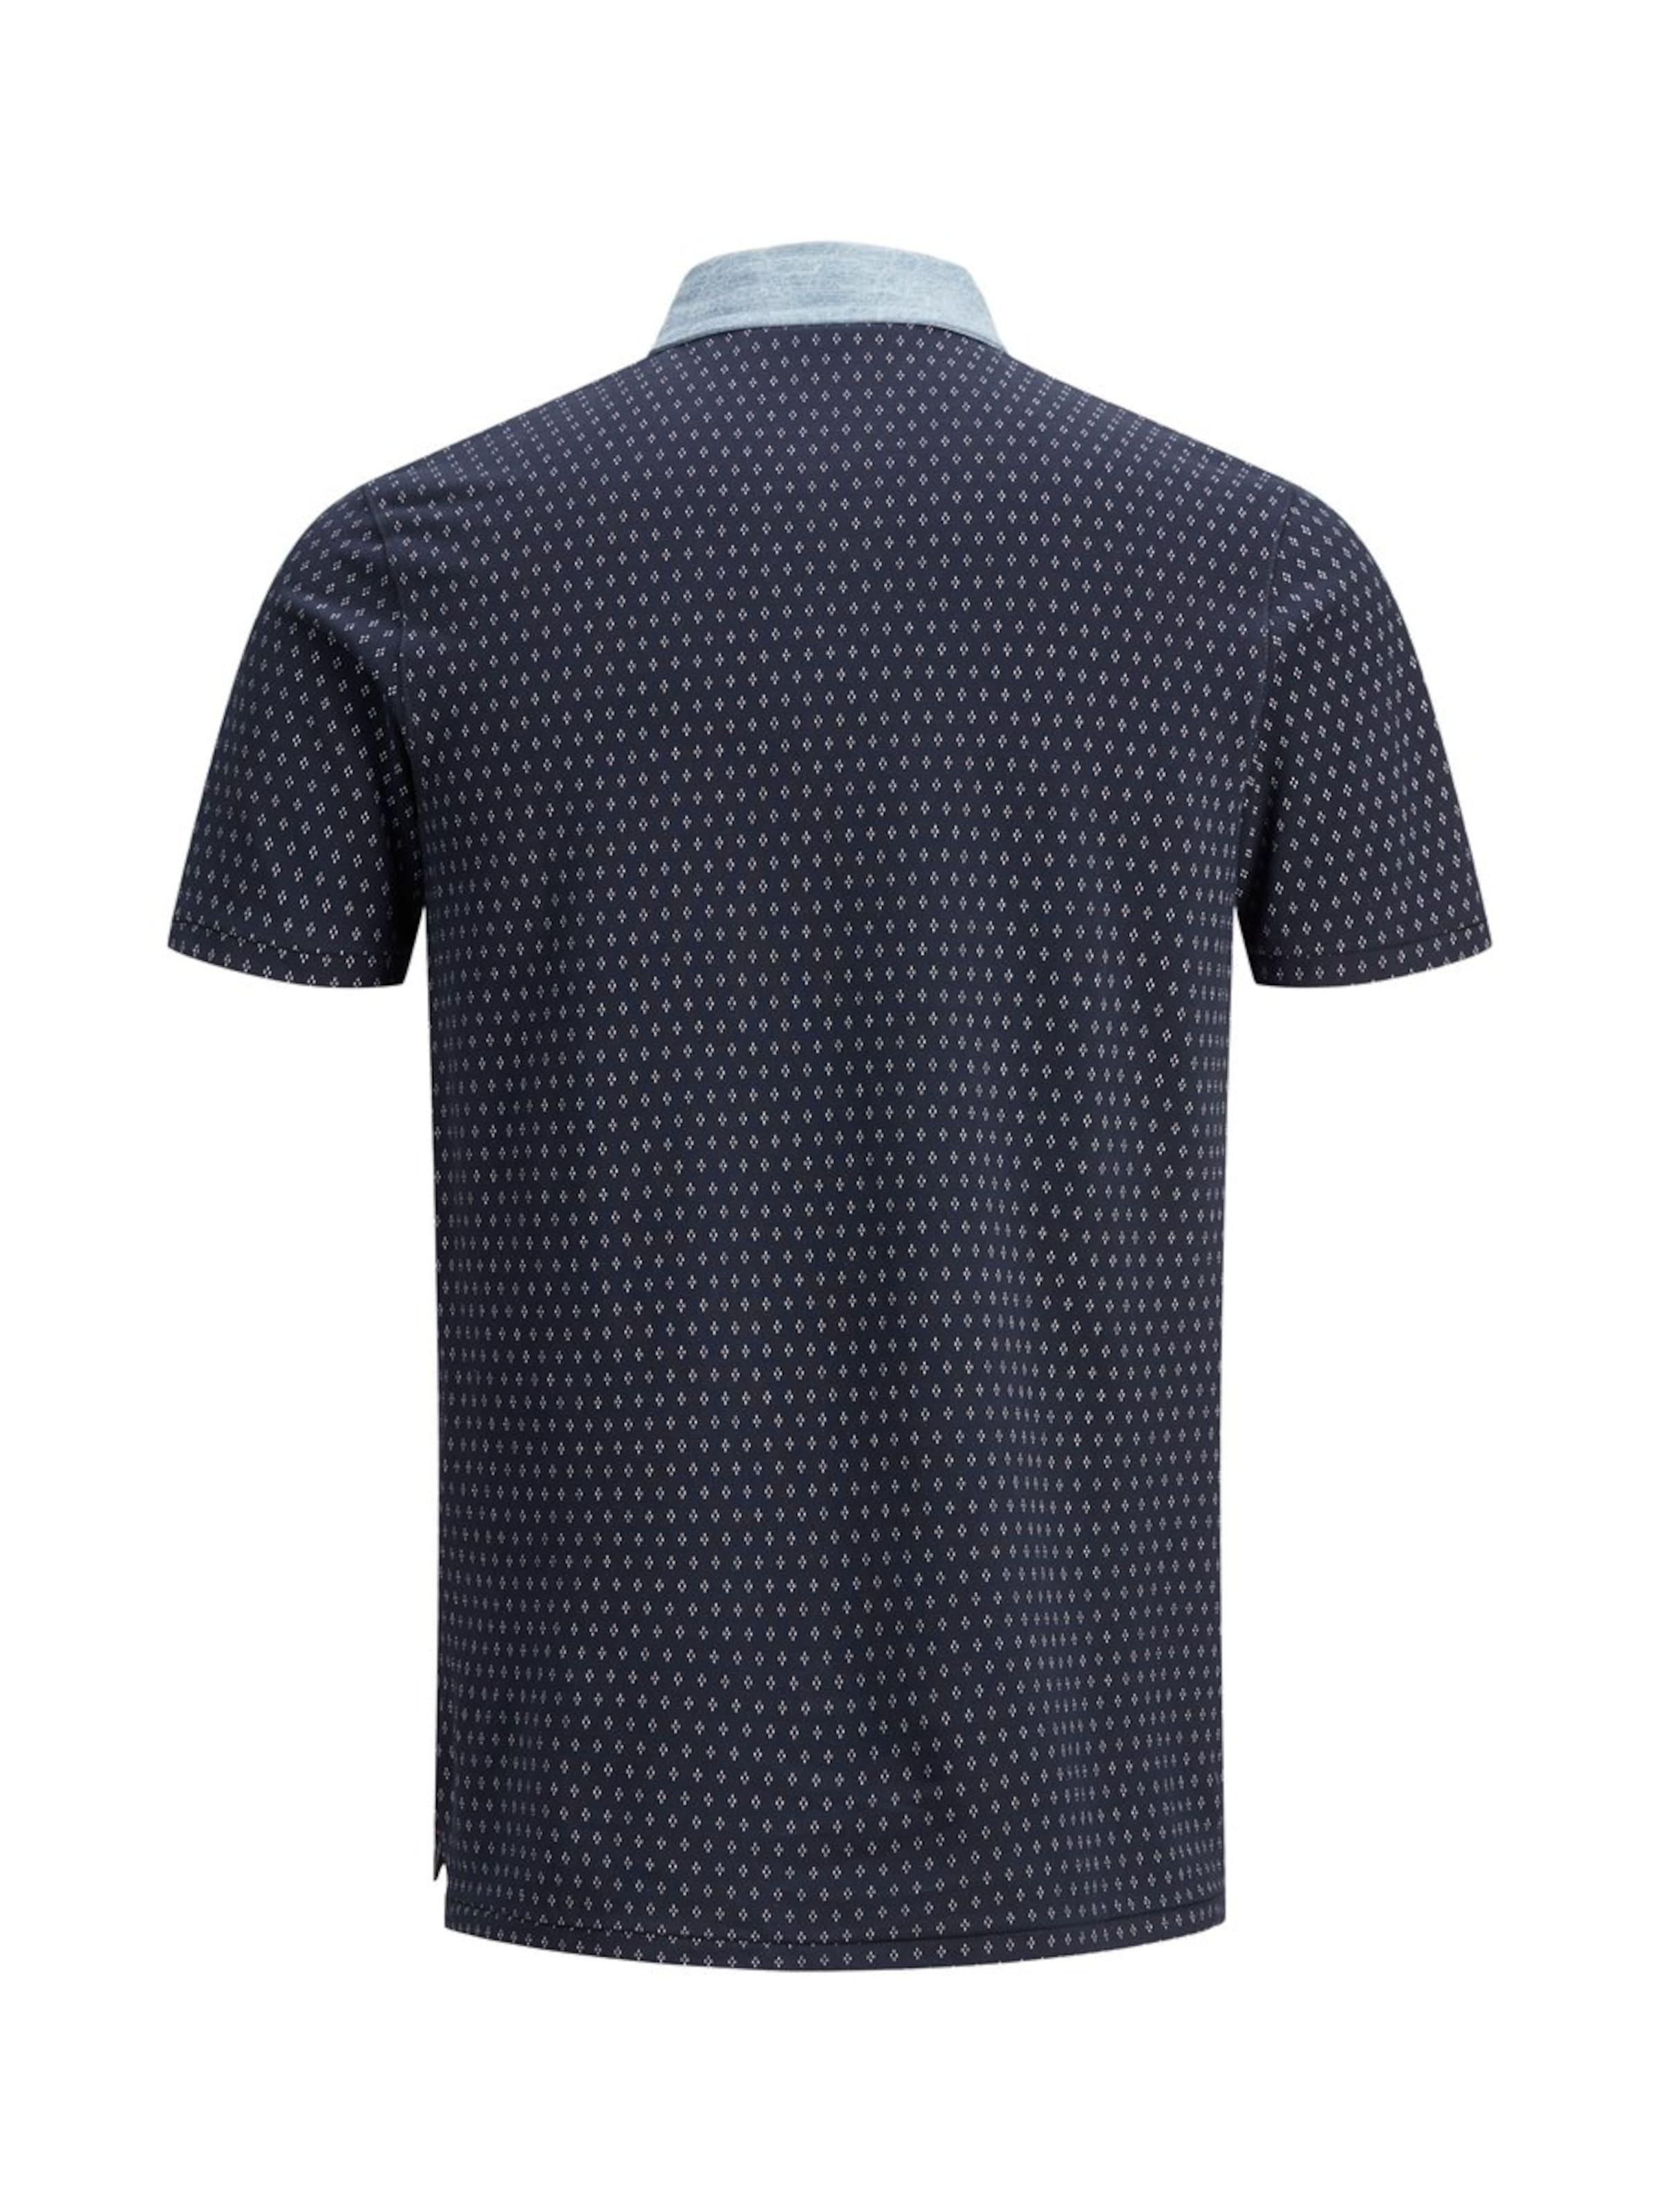 shirt Jones T 'darren En Denim Polo' Jackamp; BluSs Bleu Marine Aop KJl1cTF3